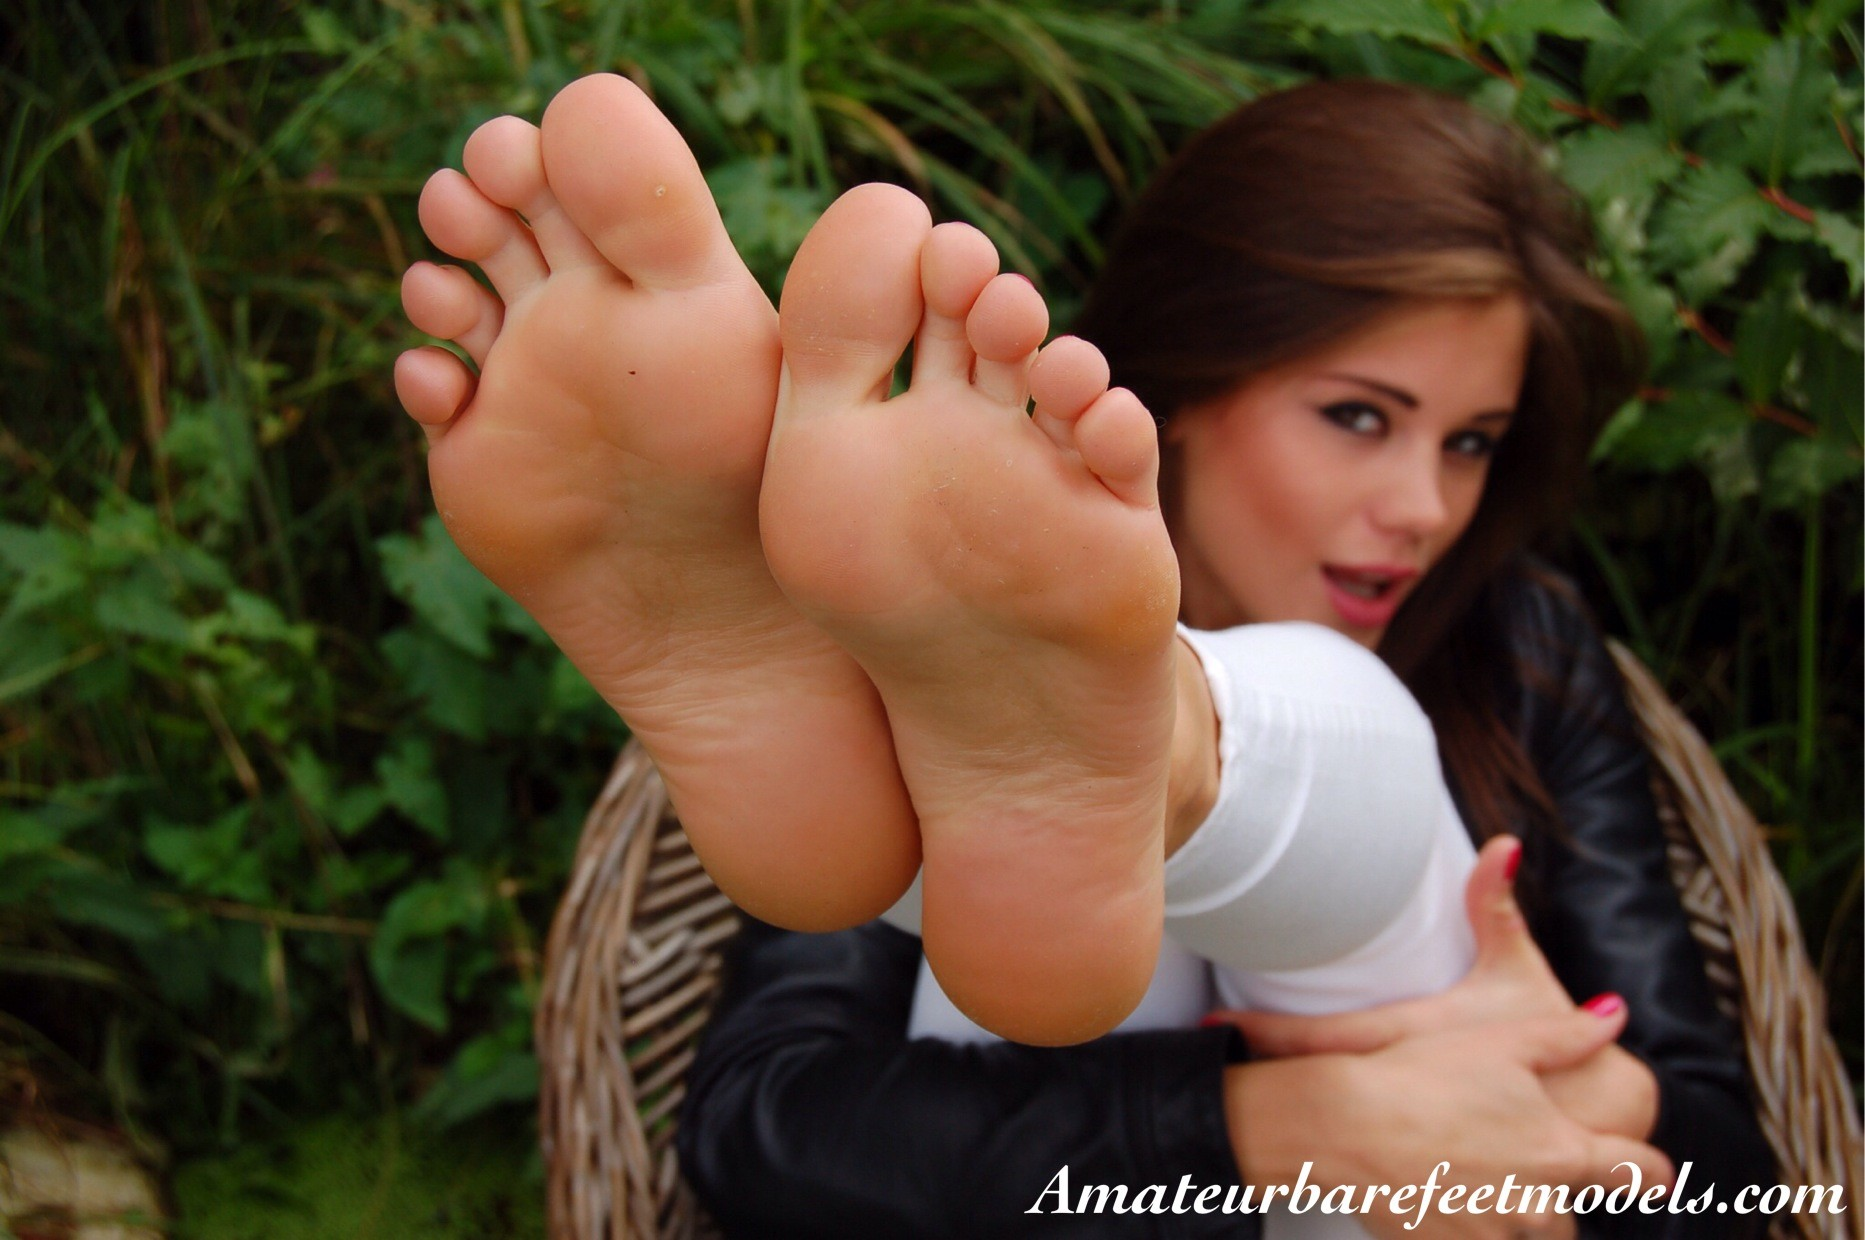 People 1865x1240 Markéta Stroblová brunette women pornstar feet feet in the air feet fetish barefoot